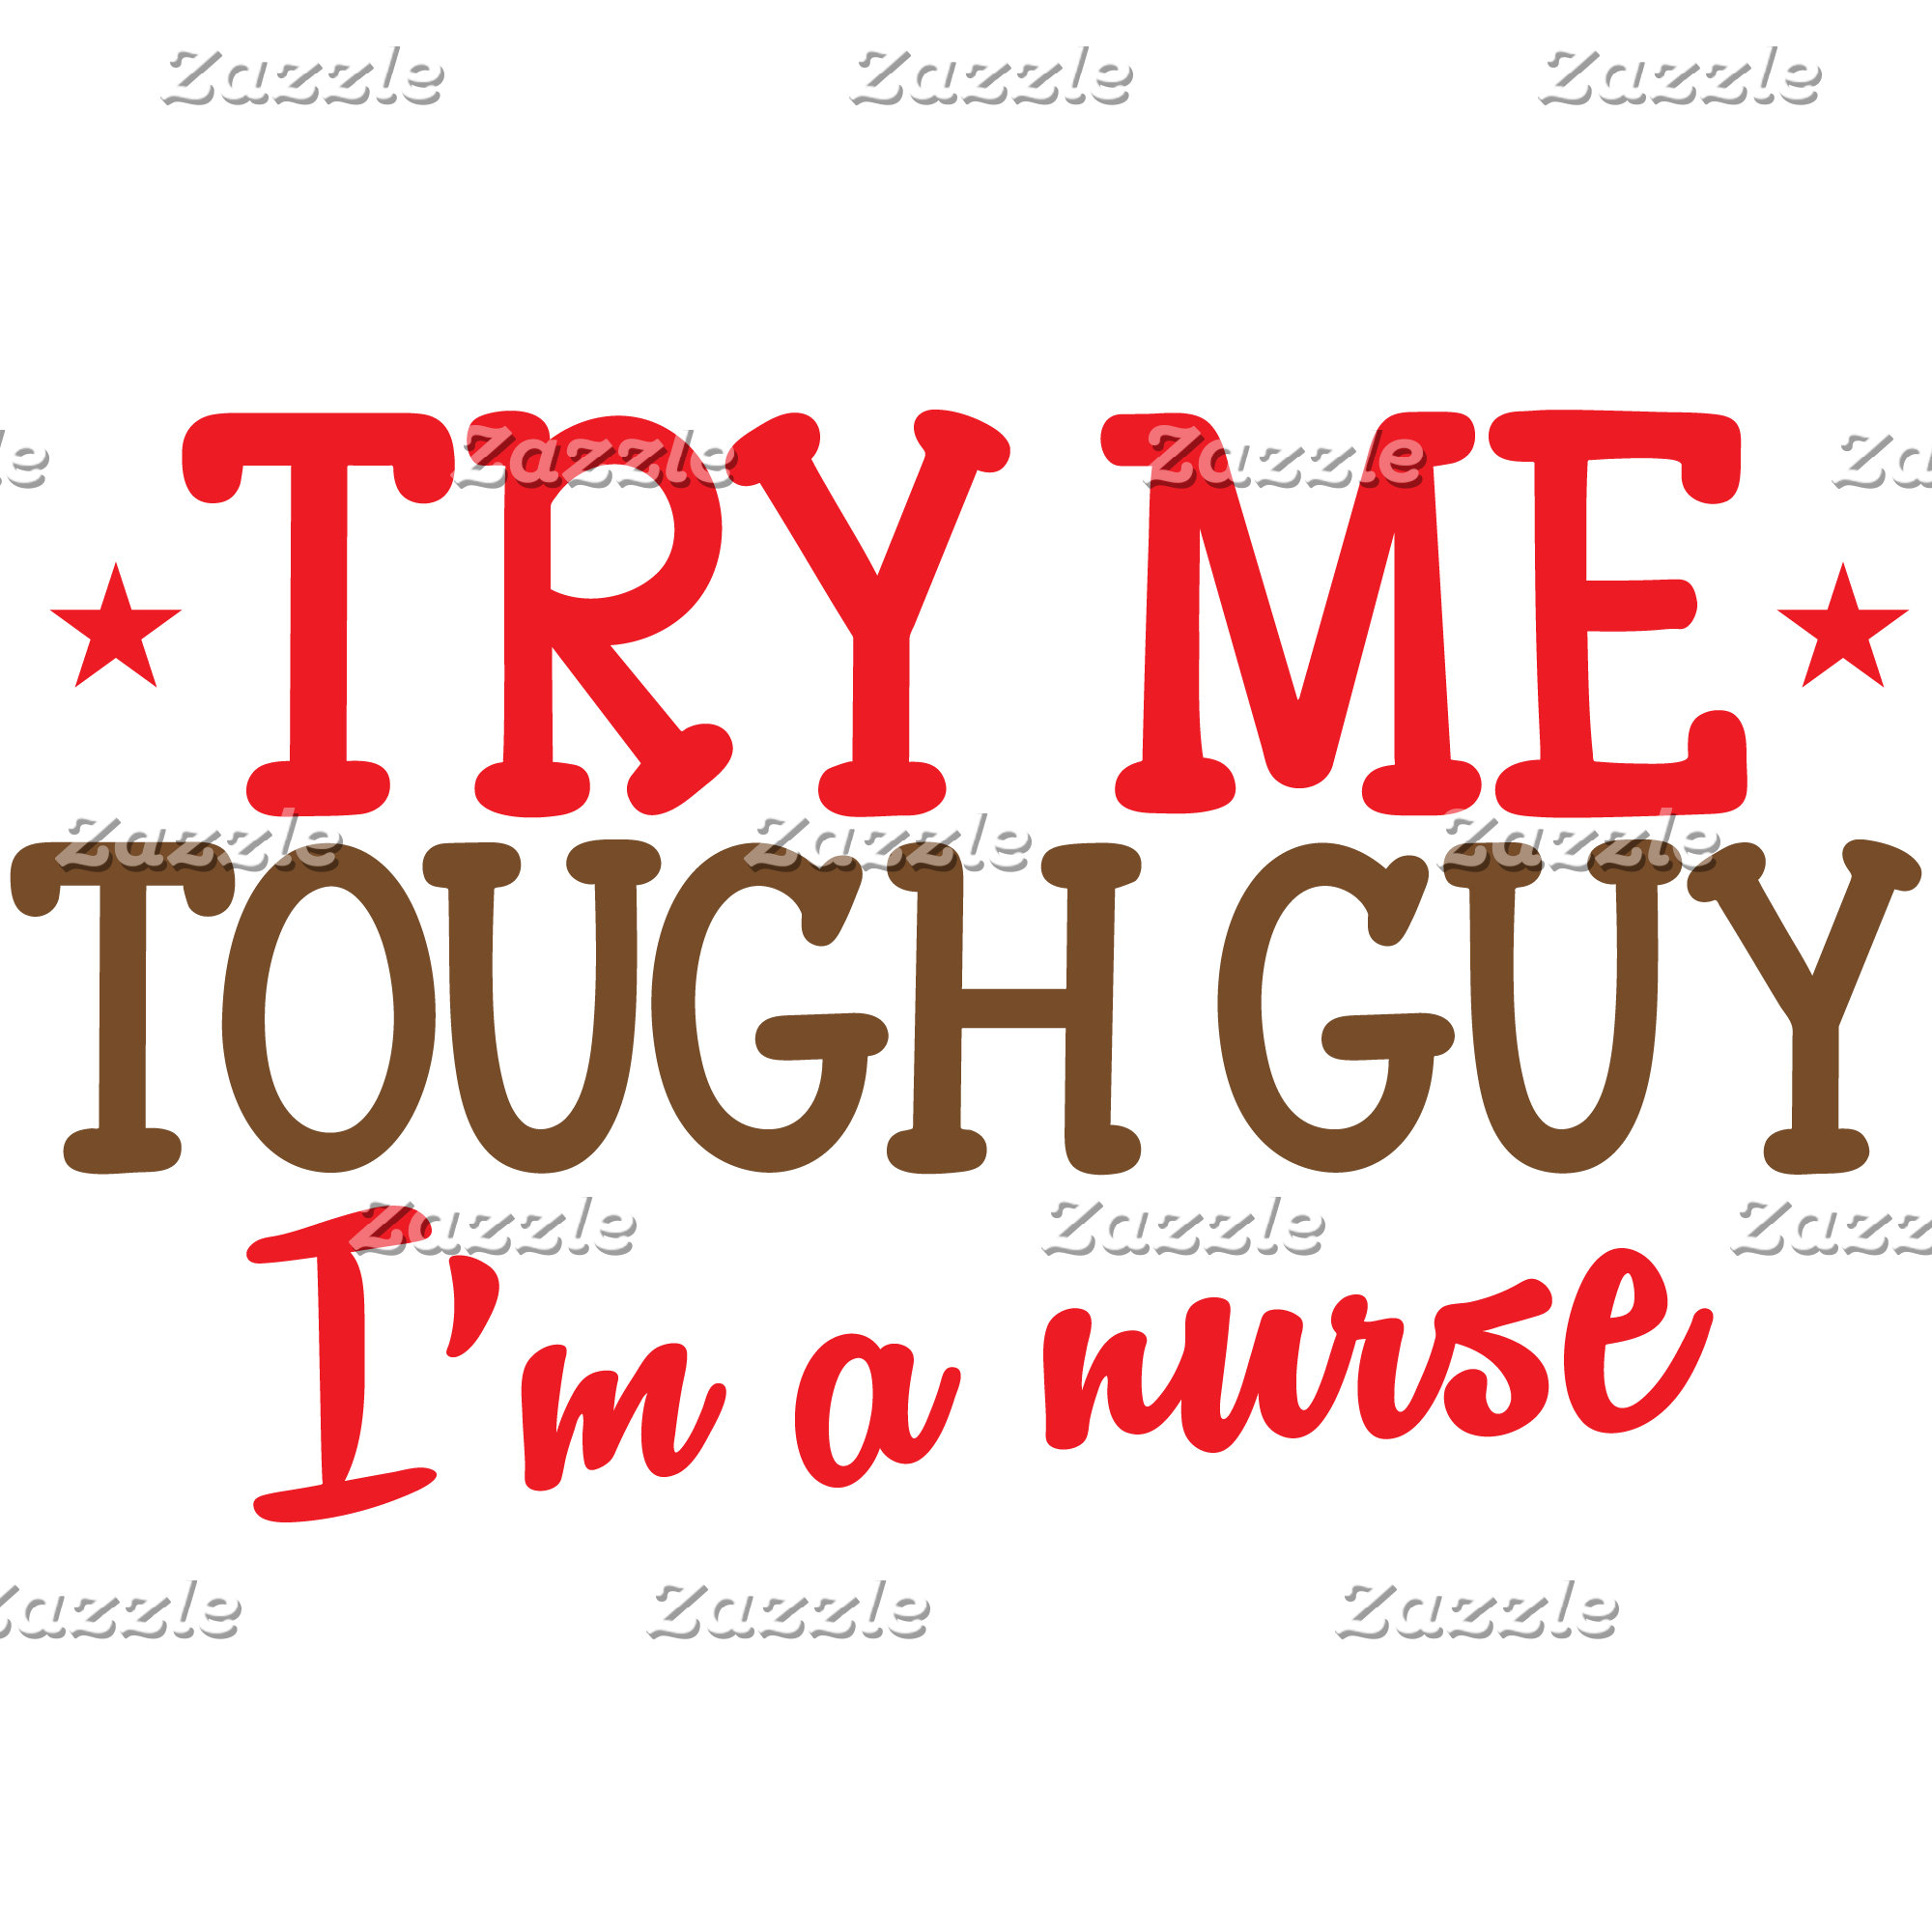 try me tough guy, I'm a nurse